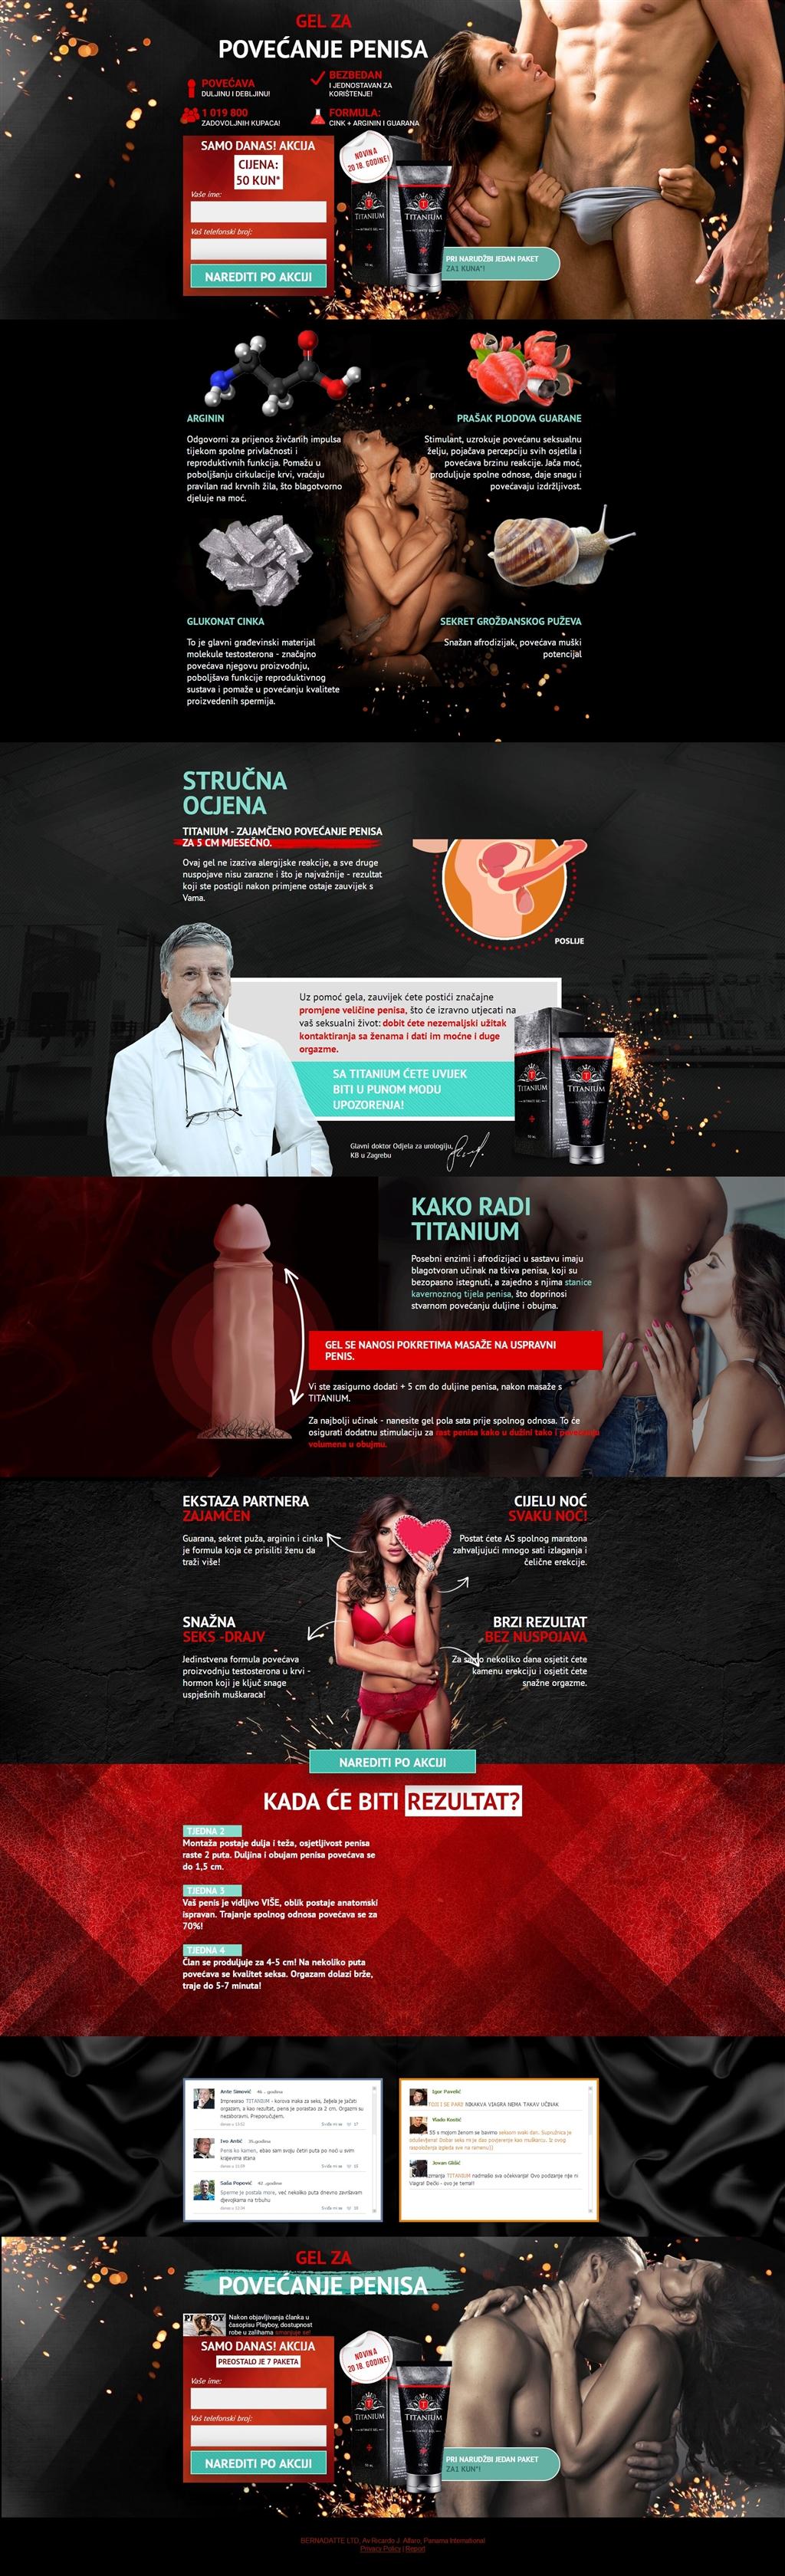 veliki penis u akciji uski seks video